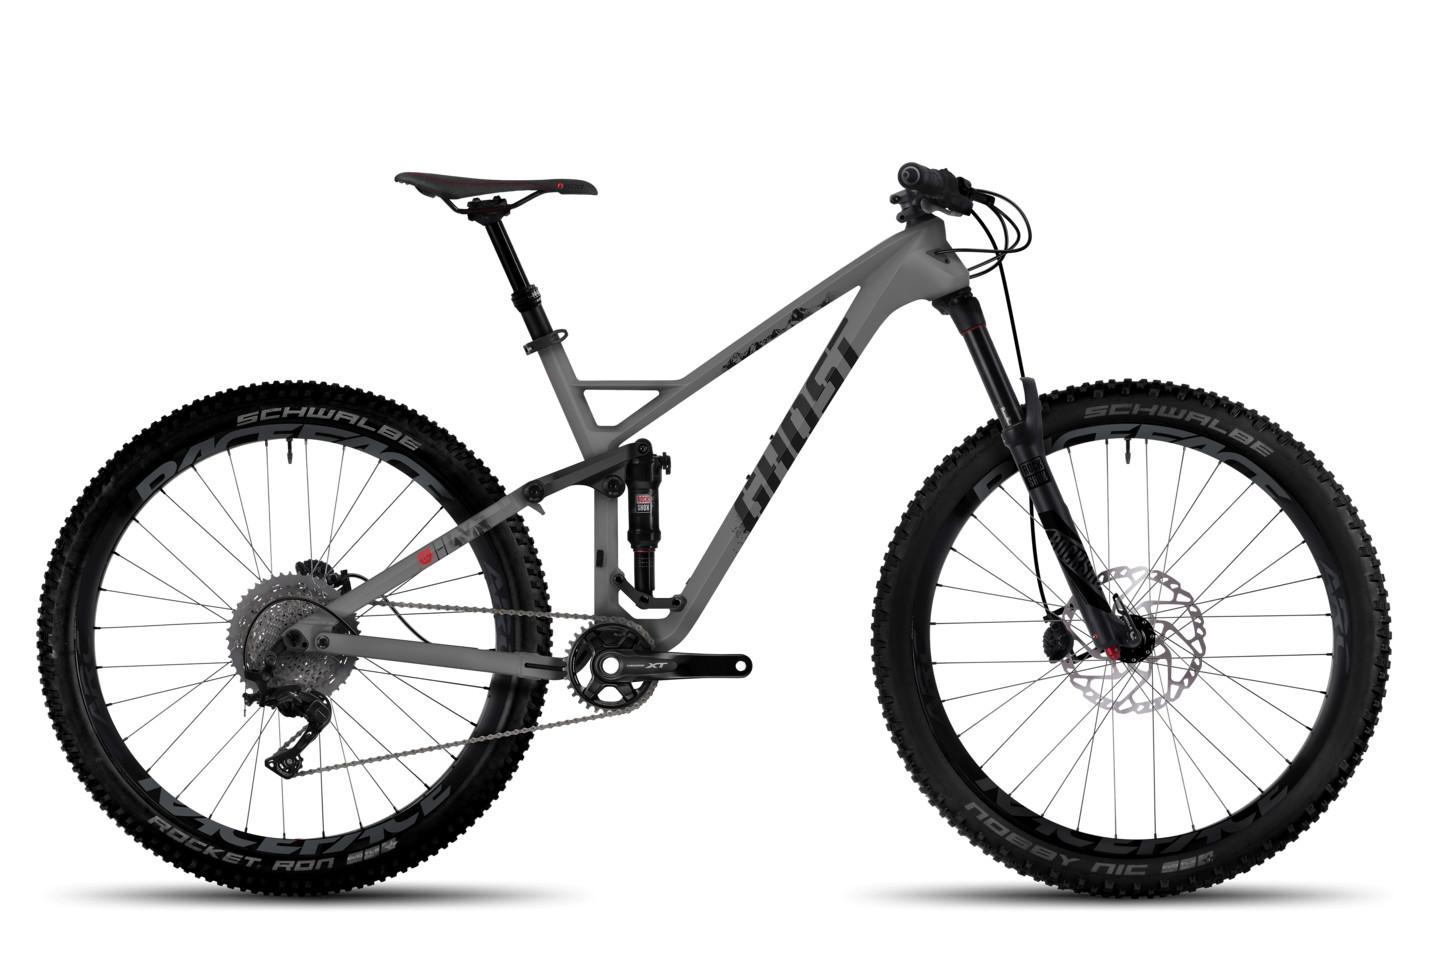 2017 ghost h amr 8 lc bike reviews comparisons specs. Black Bedroom Furniture Sets. Home Design Ideas